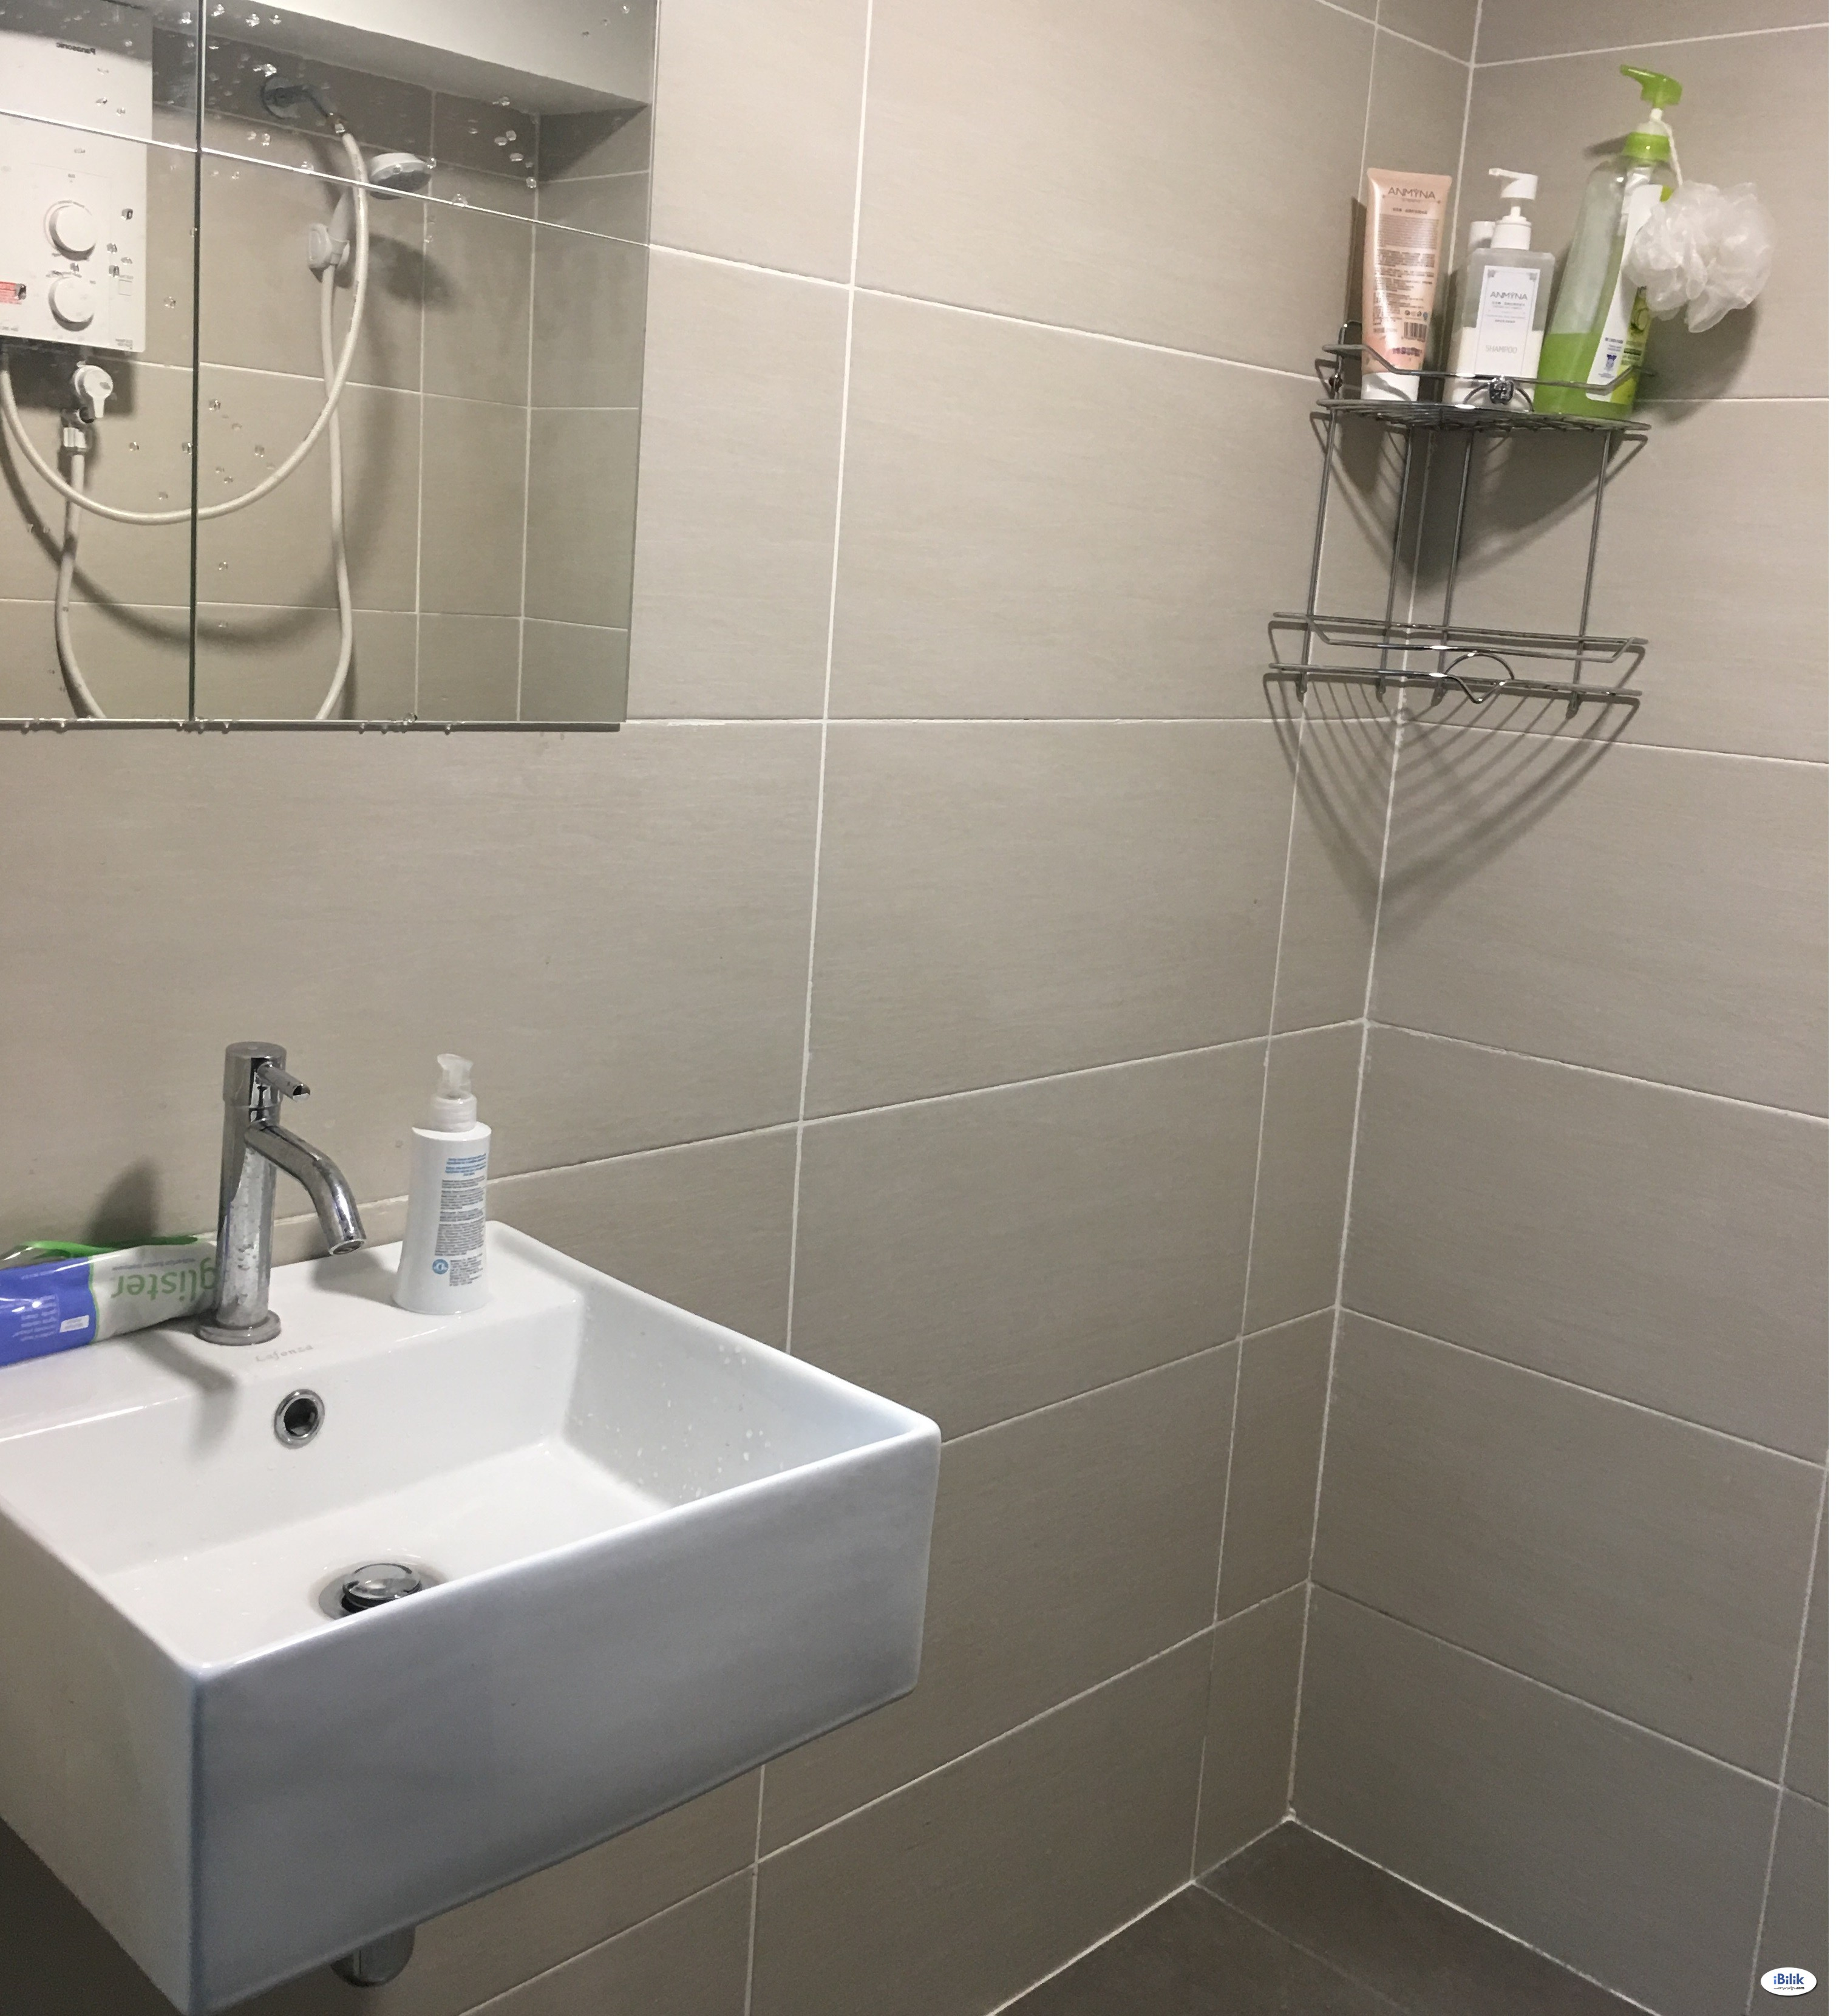 [PROMOTION] Single Room at Kelana Jaya/ Paradigm Mall/ The Ascent/ Kelana Square